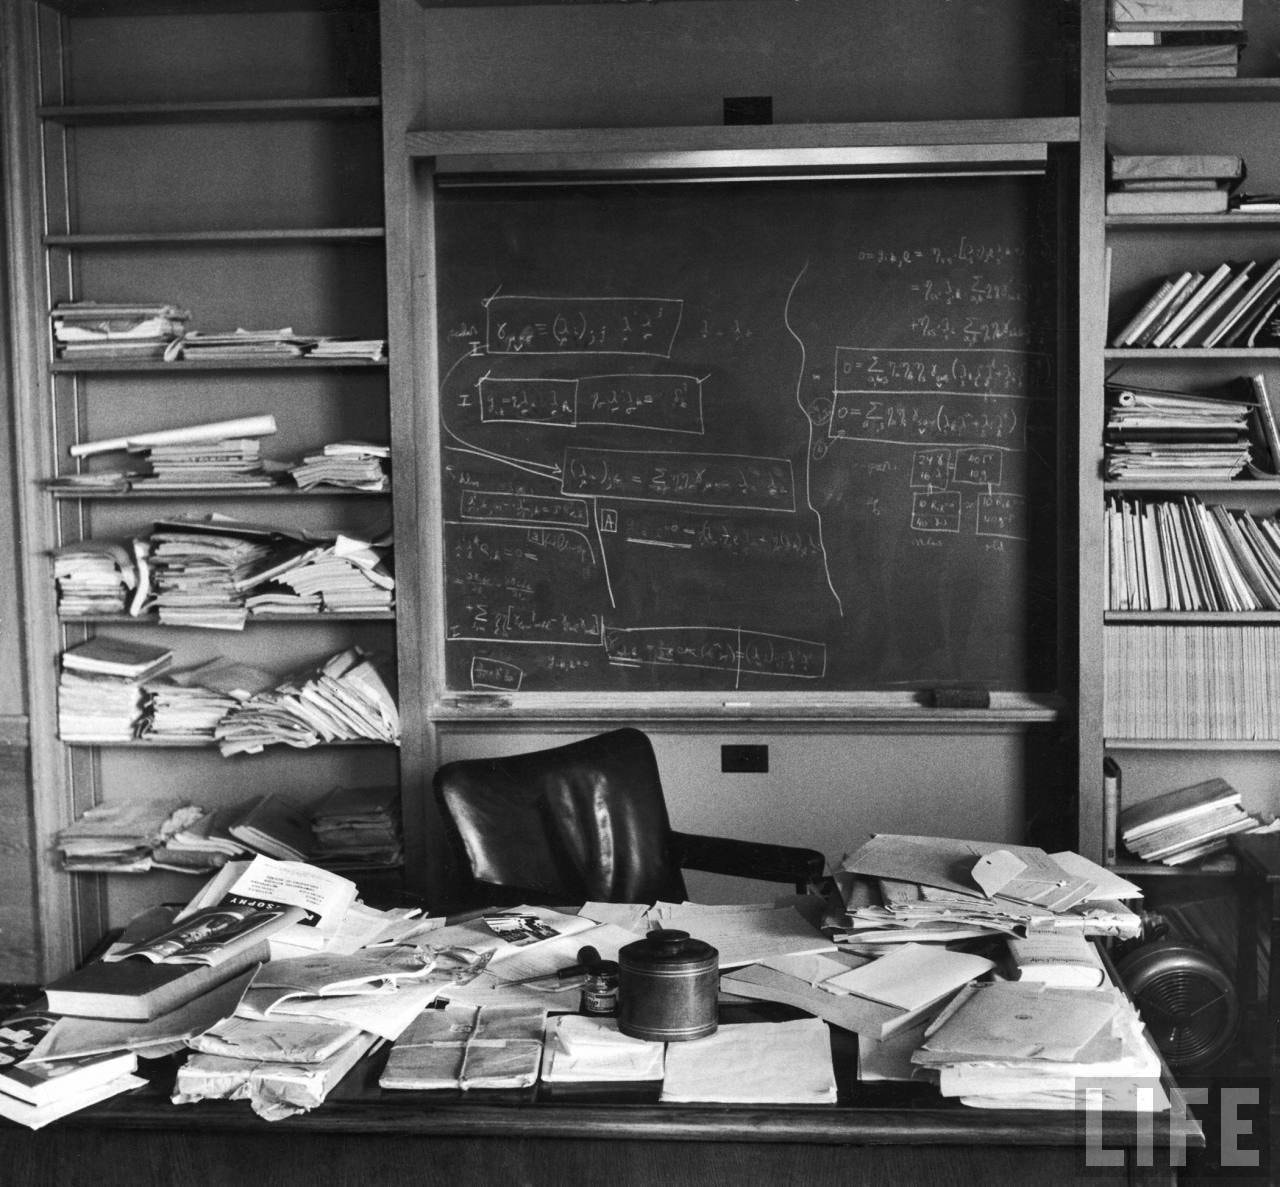 Einstein's desk the day he died. Ralph Morse / Time